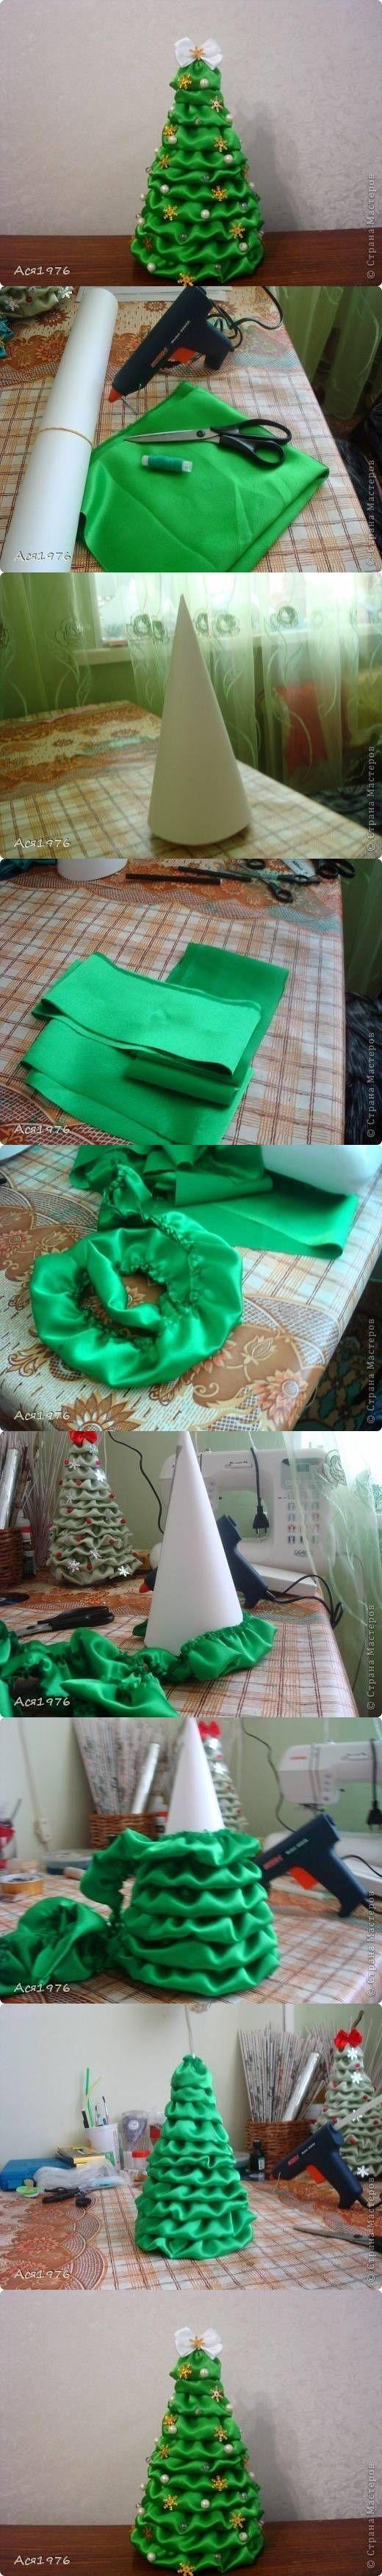 DIY Fabric Christmas Tree DIY Fabric Christmas Tree